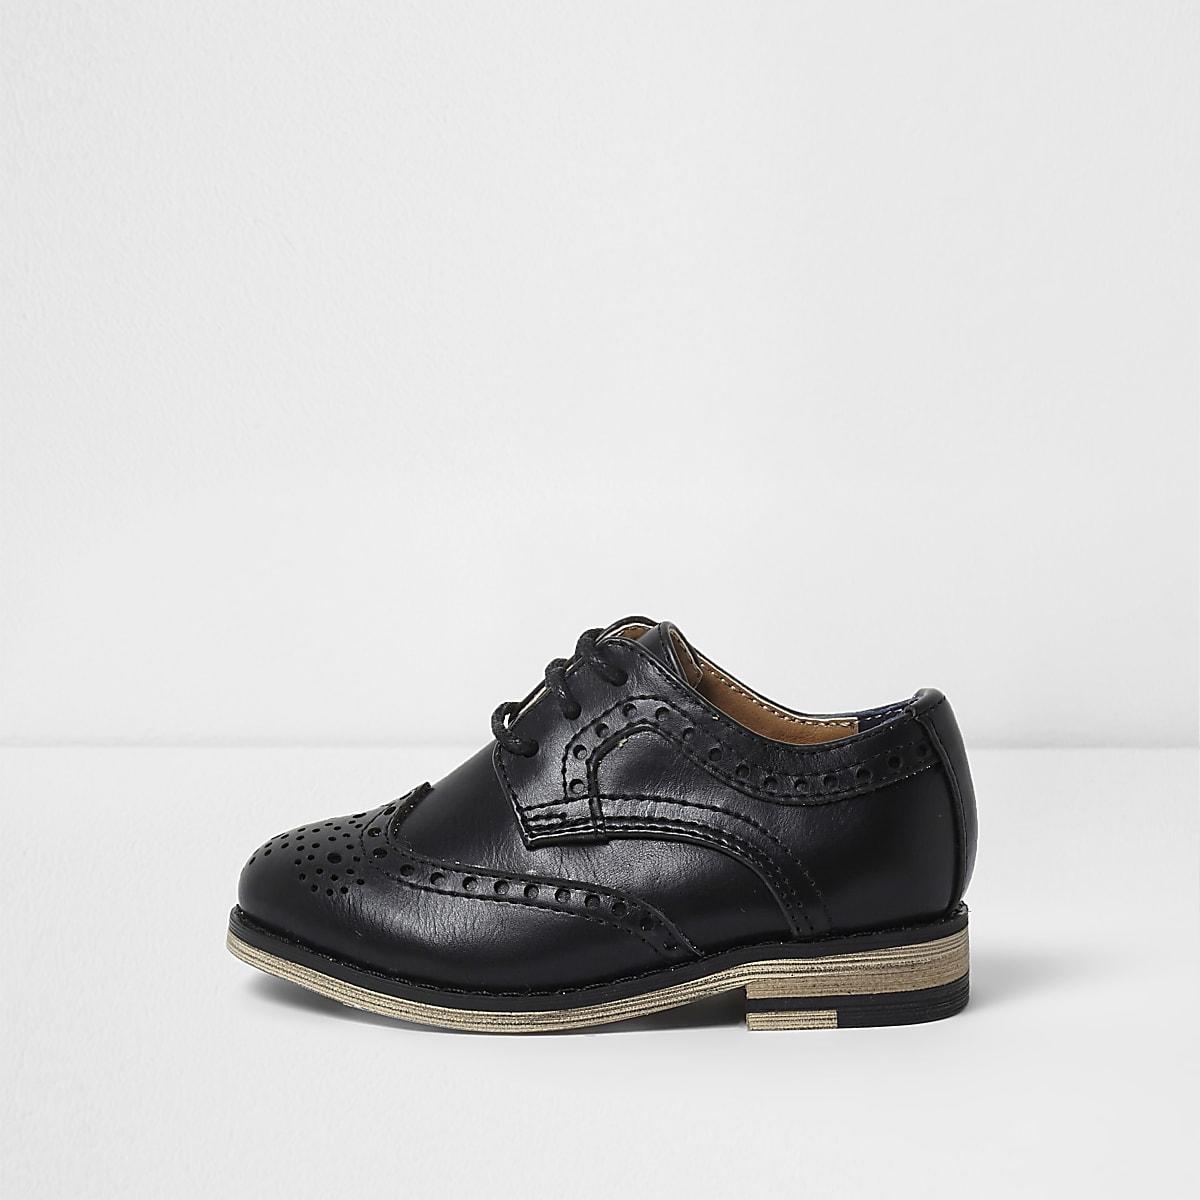 46e6cae4fa32 Mini boys black brogues - Baby Boys Shoes - Baby Boys Shoes   Boots - Mini  Boys - boys